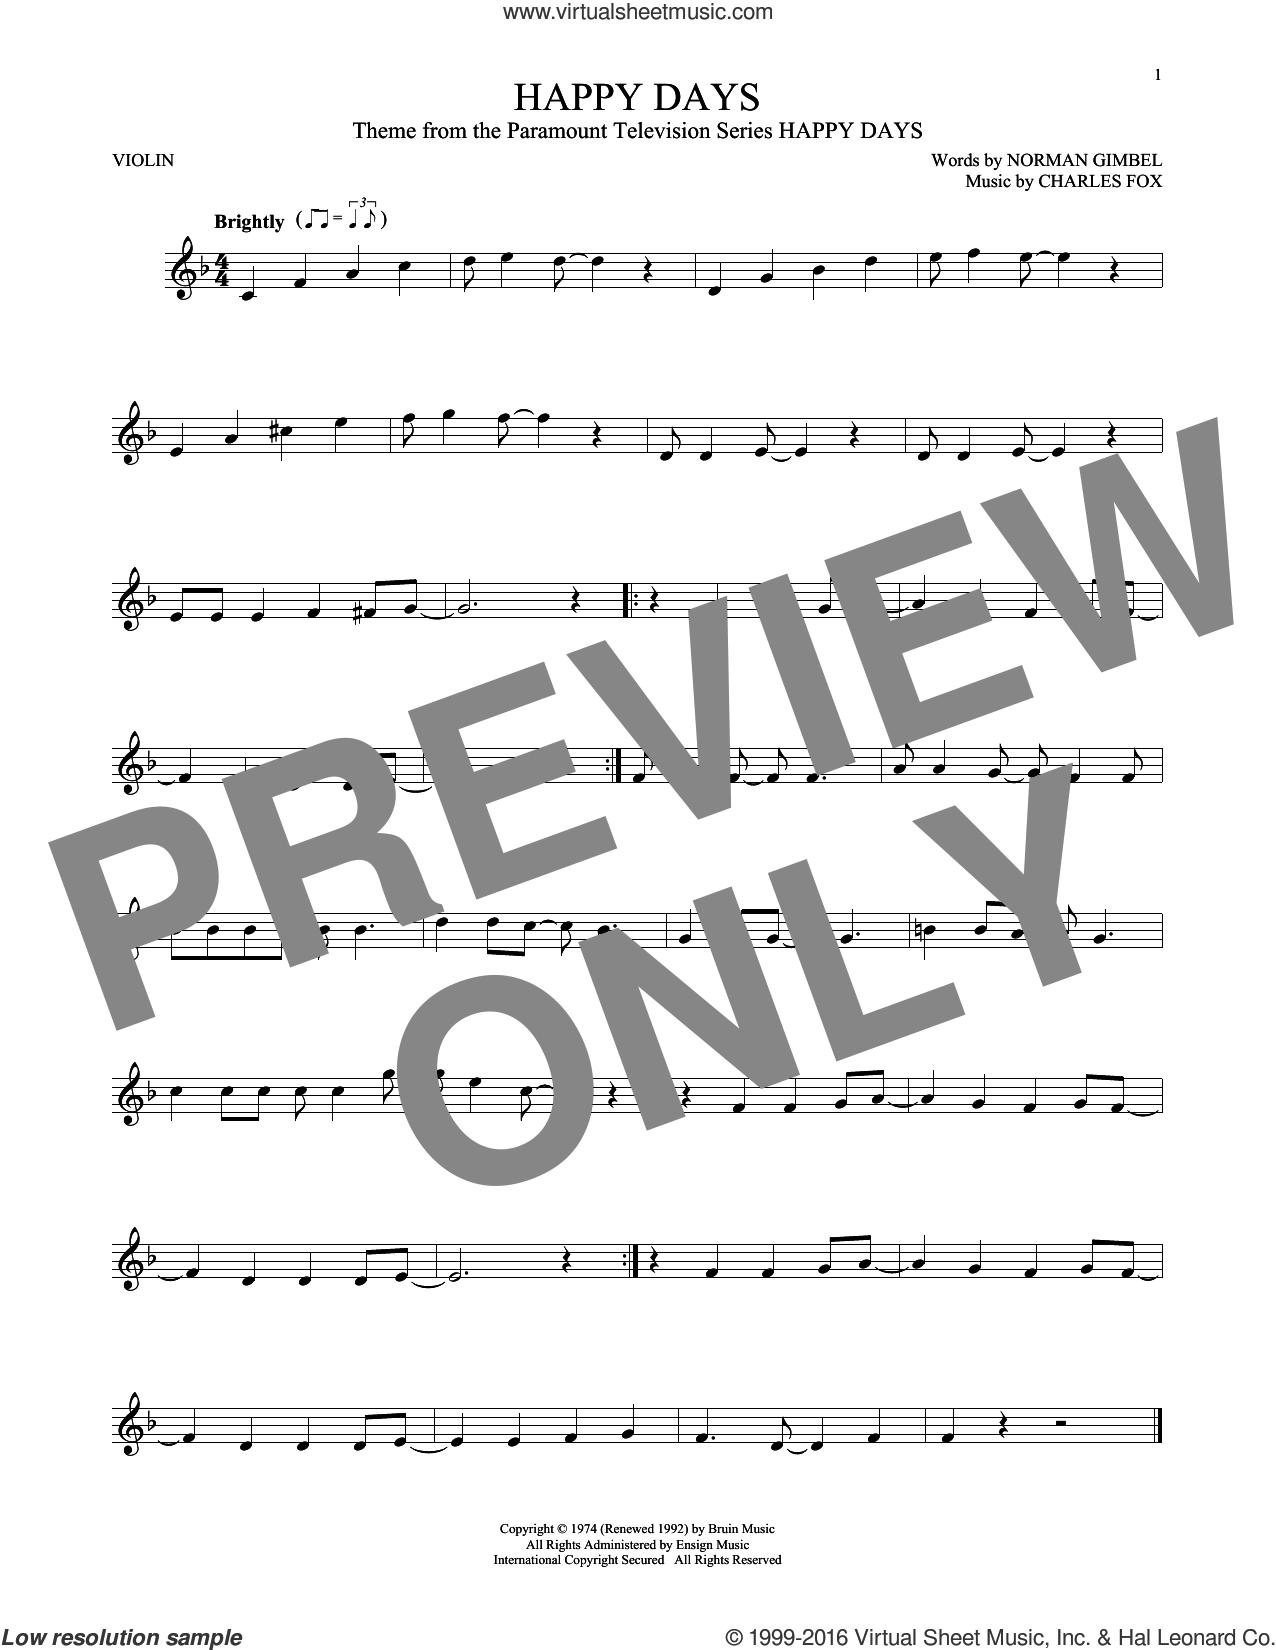 Happy Days sheet music for violin solo by Norman Gimbel, Charles Fox, Norman Gimbel & Charles Fox and Pratt and McClain, intermediate skill level